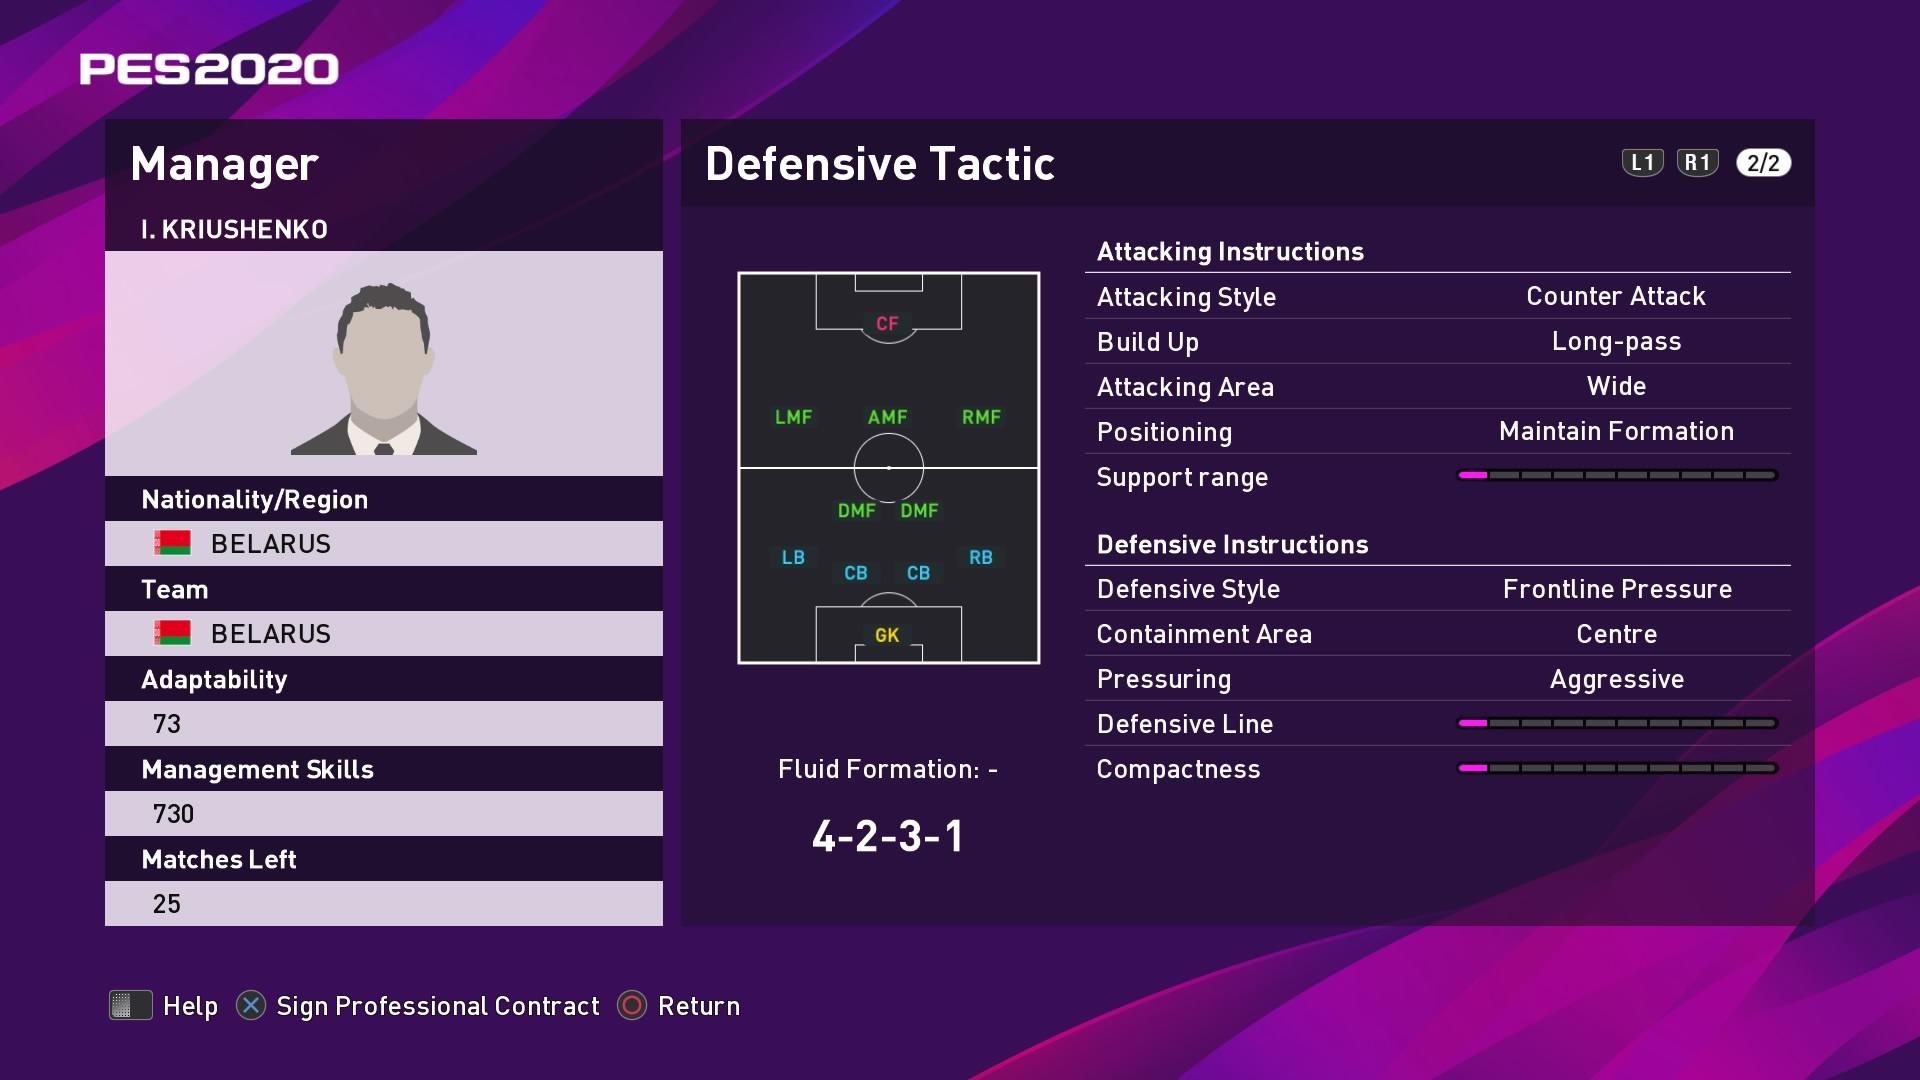 I. Kriushenko (Igor Kriushenko) Defensive Tactic in PES 2020 myClub